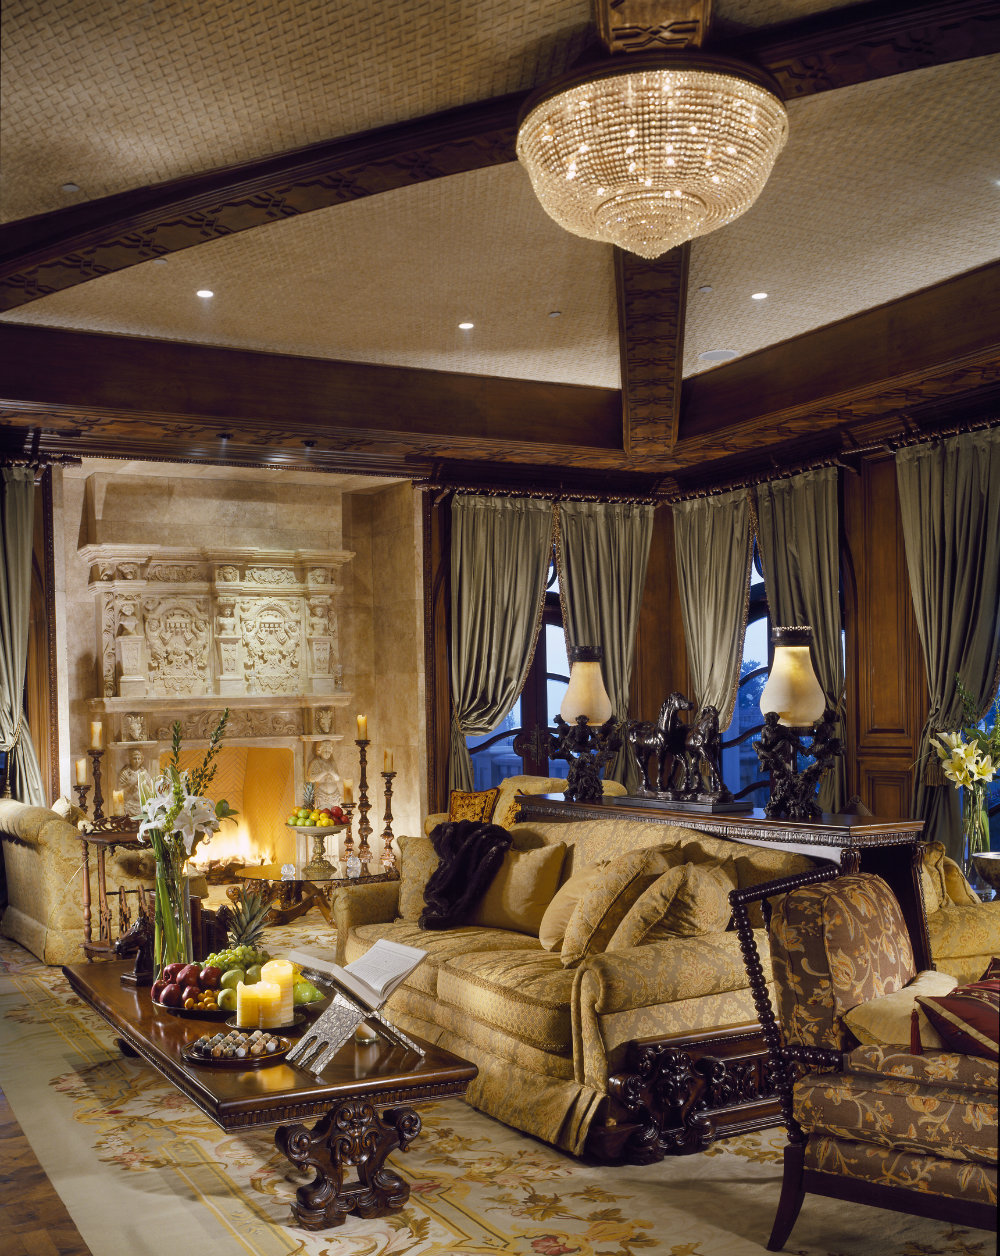 Gigi Hadid's Father Gigi Hadid's Father is Selling an Impressive Mansion for $85 Million Gigi Hadids Father is Selling an Impressive Mansion for 85 Million 10